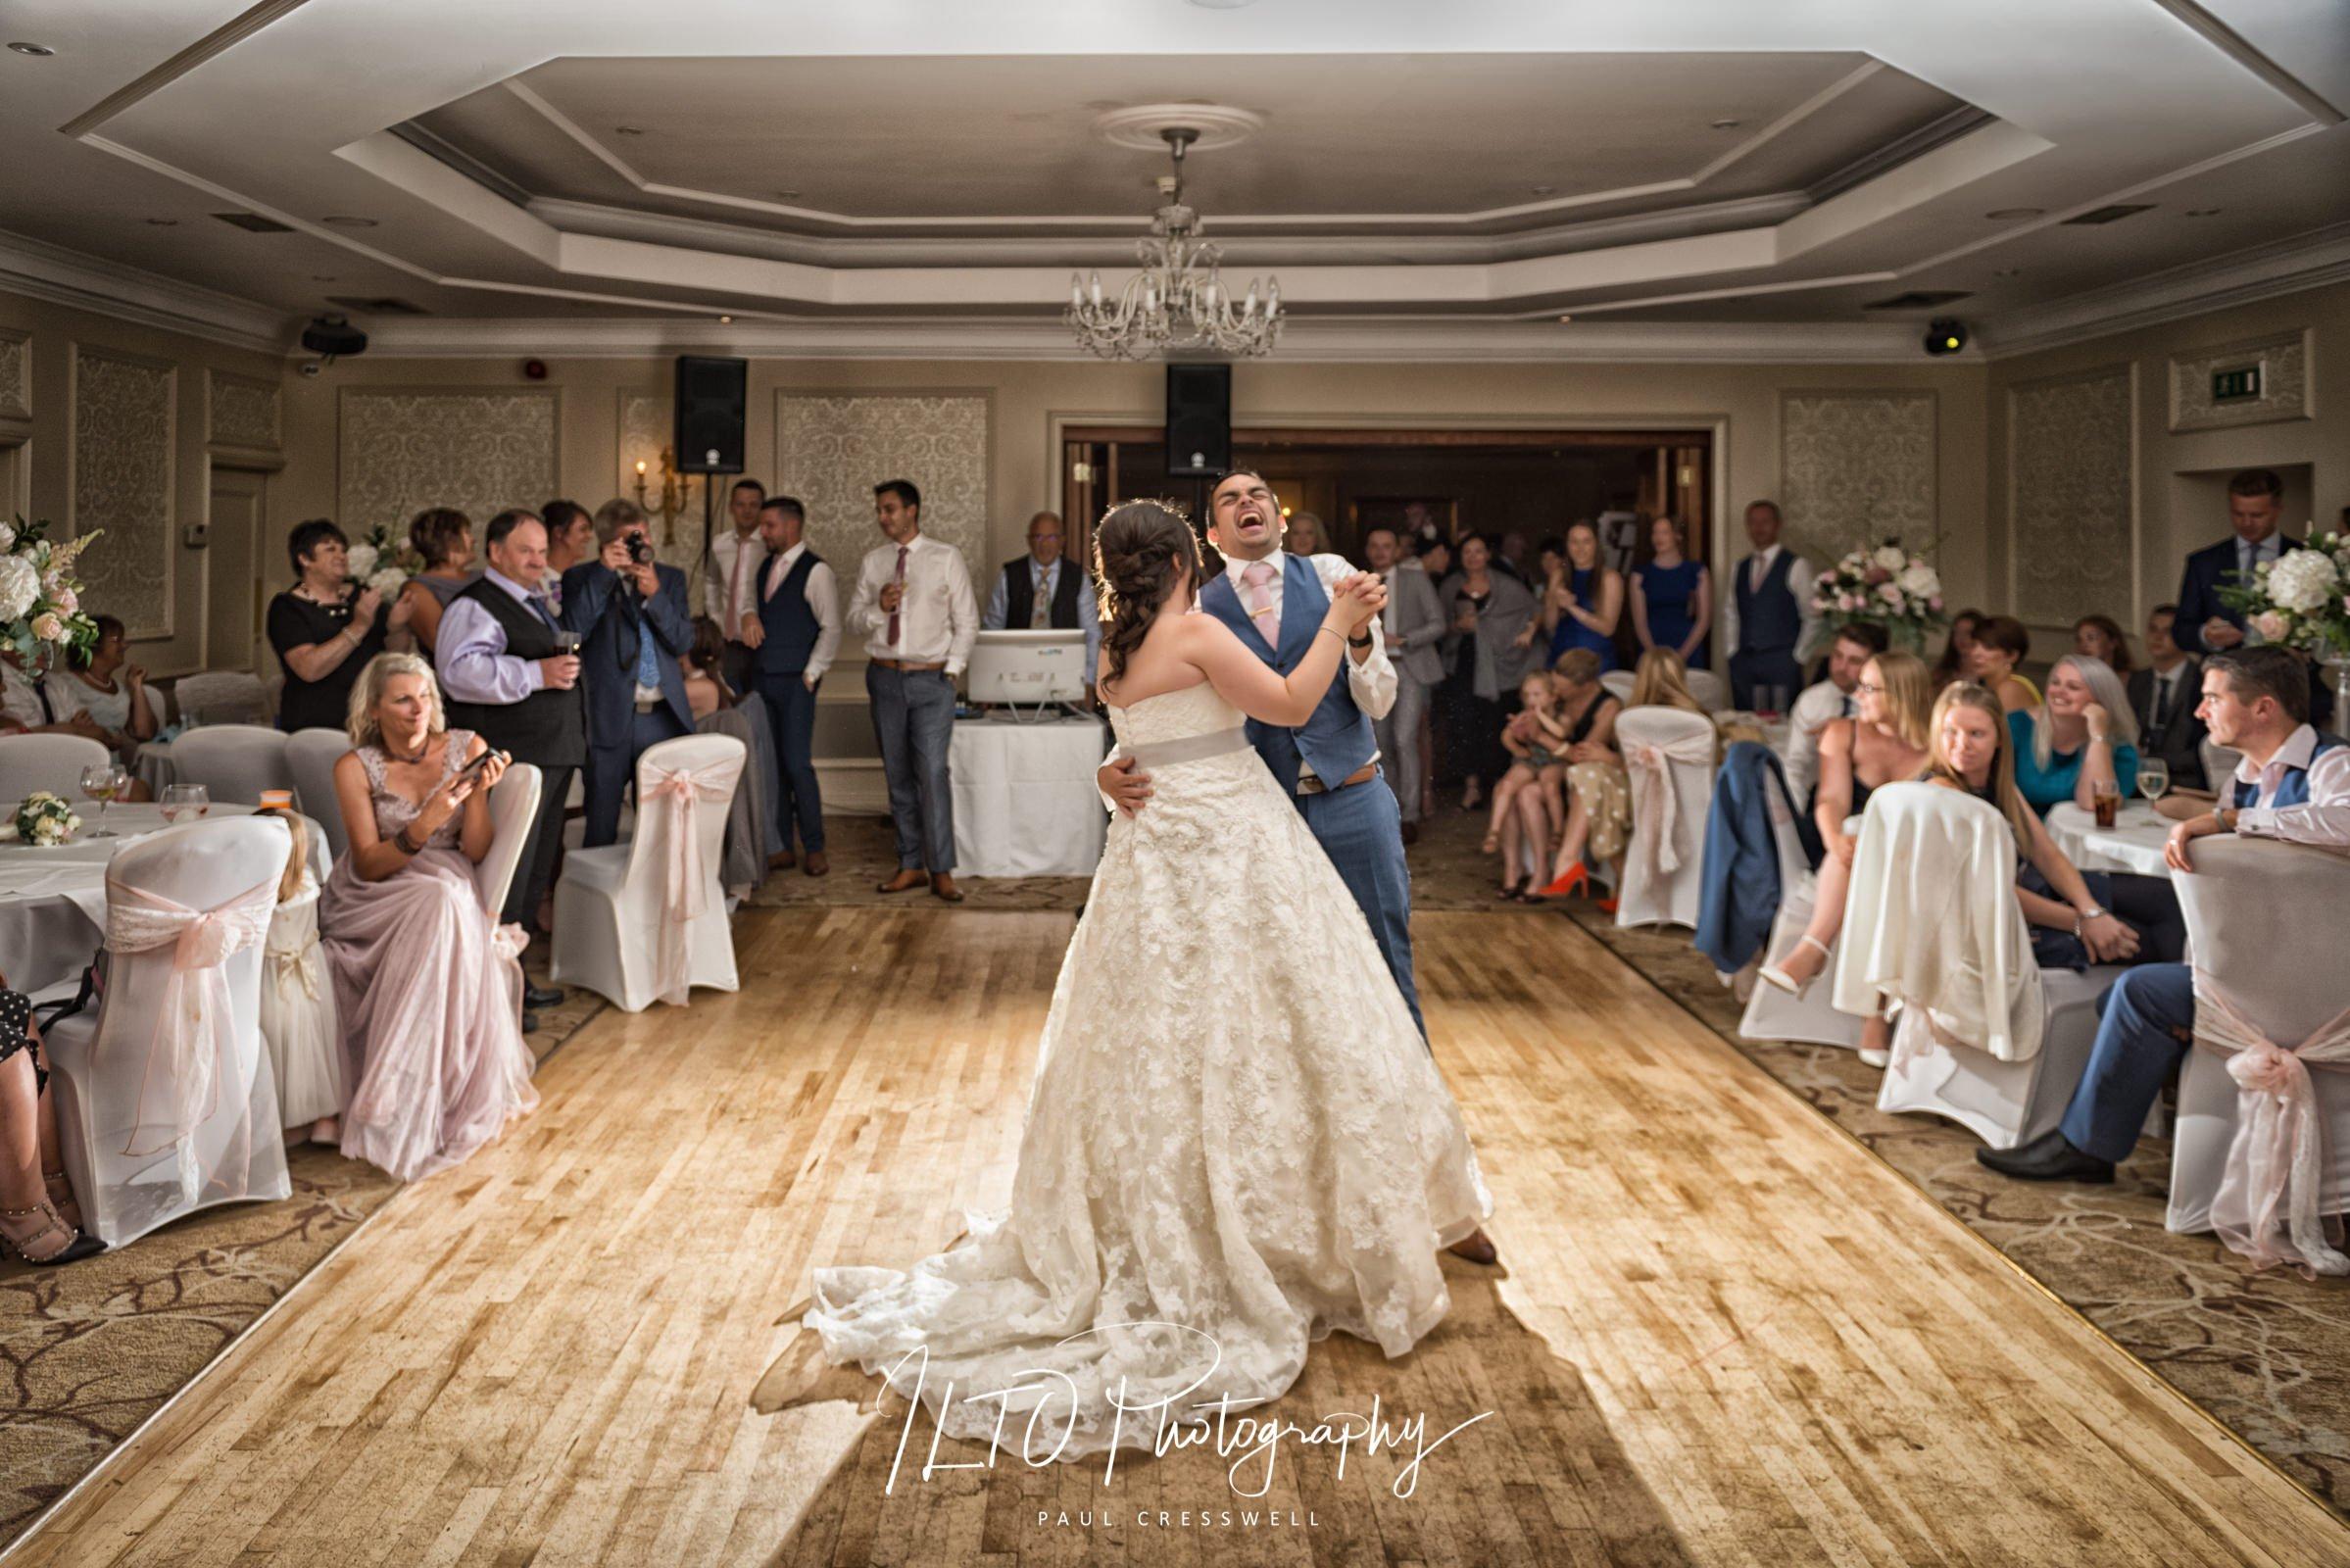 Funny wedding photos first dance wentbridge house hotel